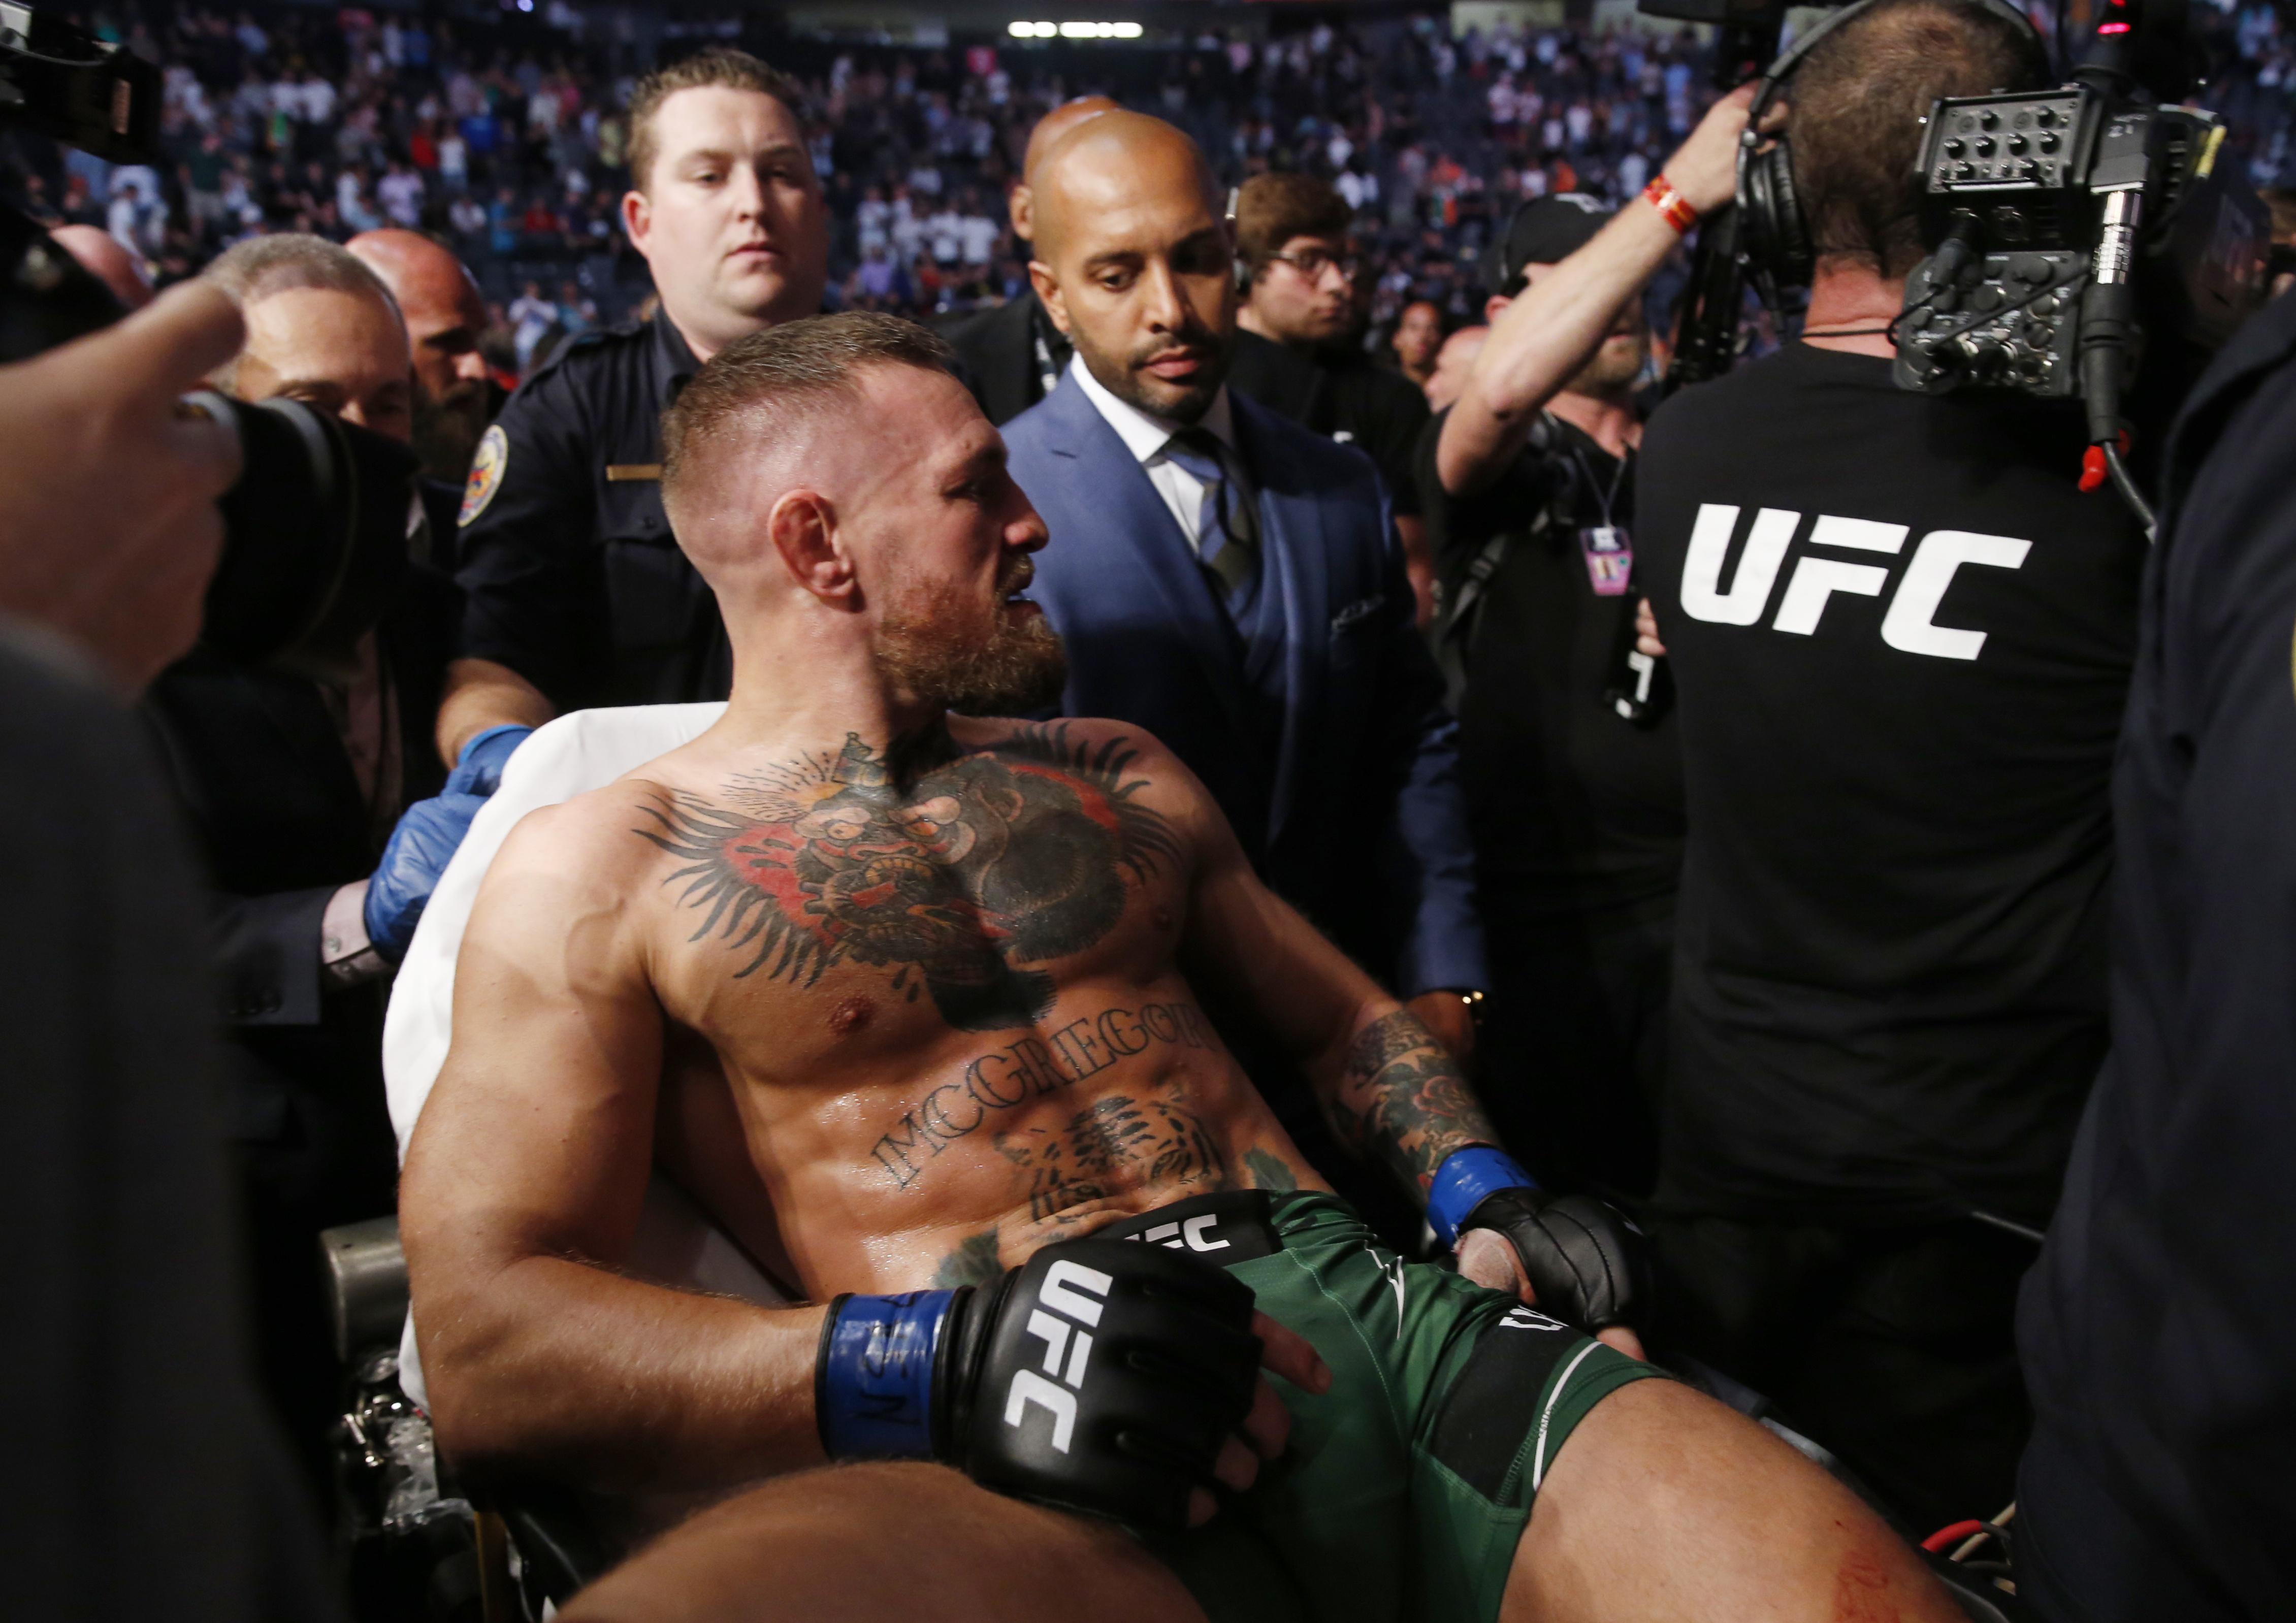 McGregor breaks leg in latest UFC loss to Dustin Poirier | Reuters